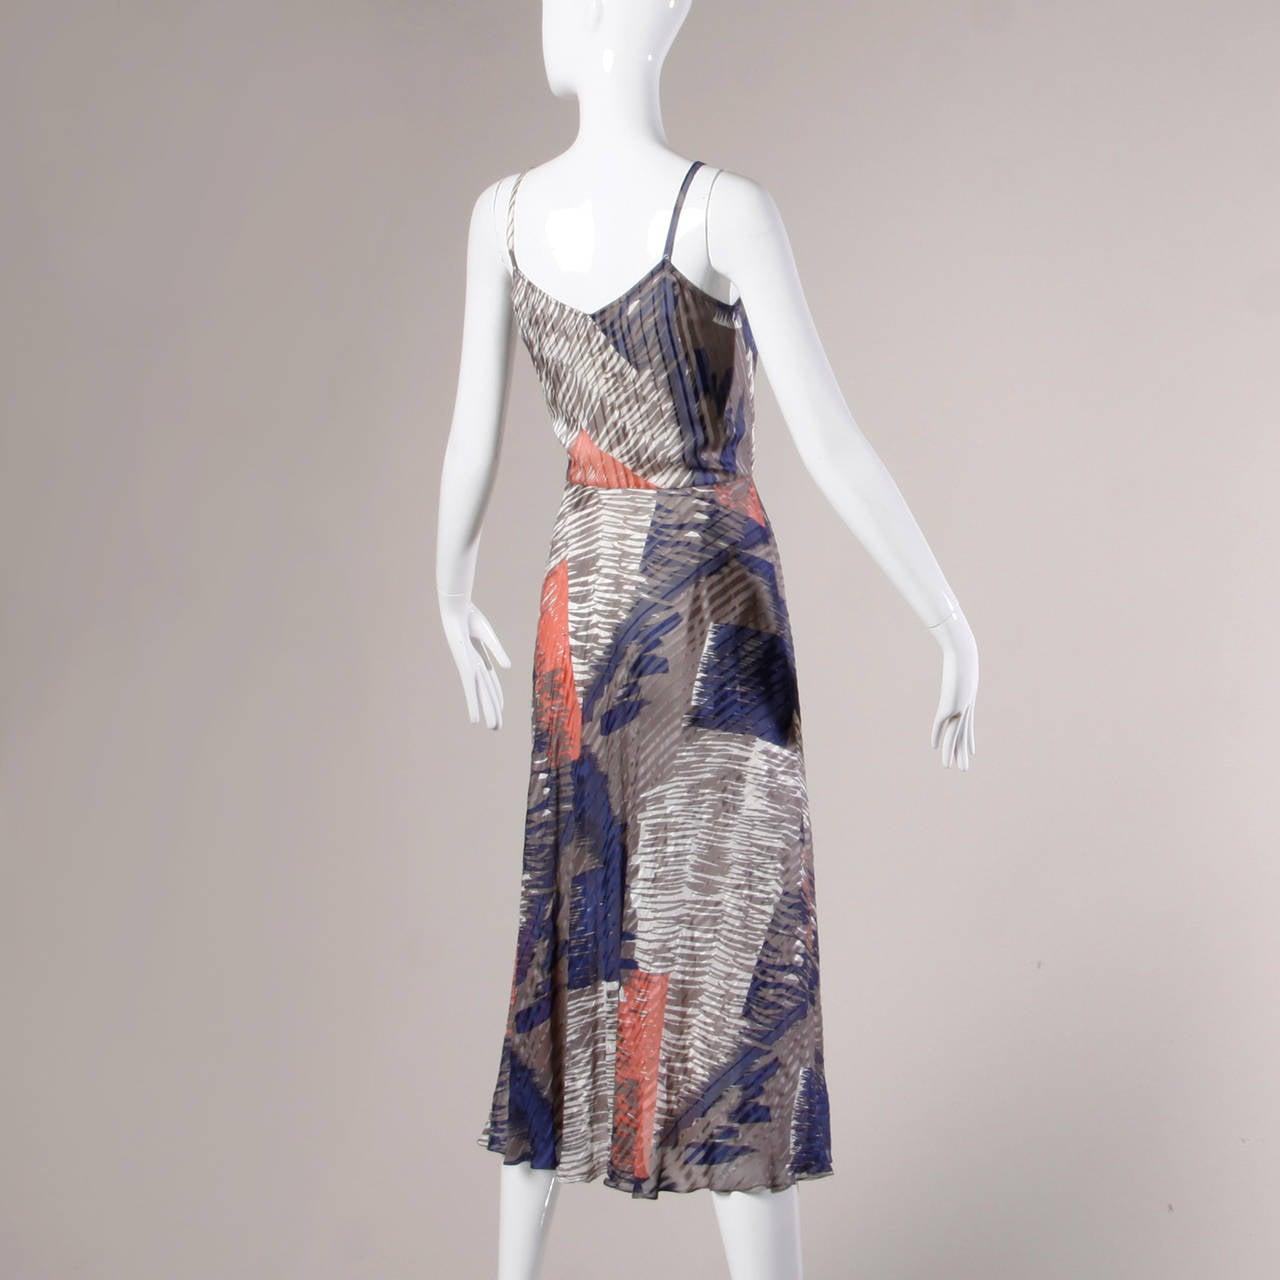 Vintage Sheer Printed Silk Chiffon Dress 3